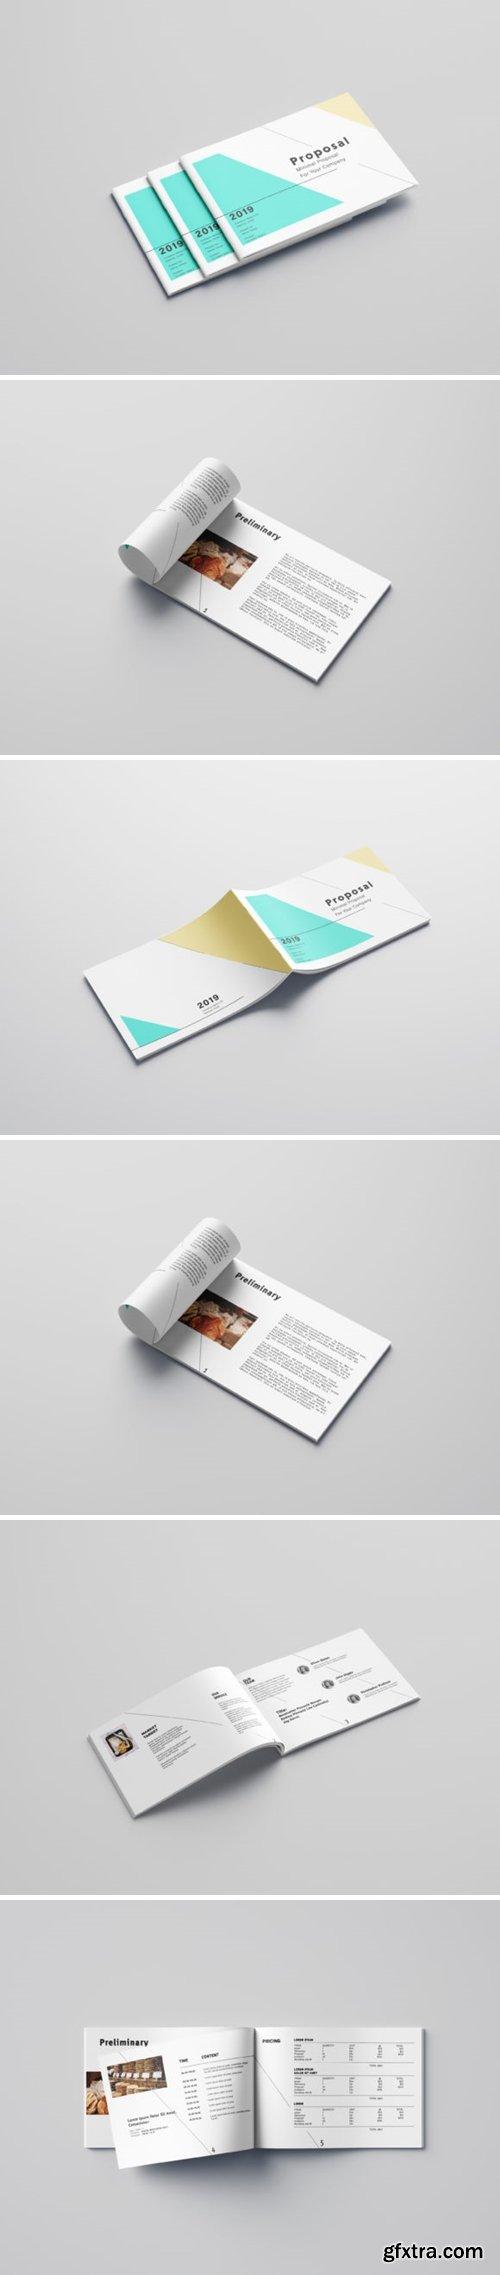 Minimalist Proposal Template Design 2013813